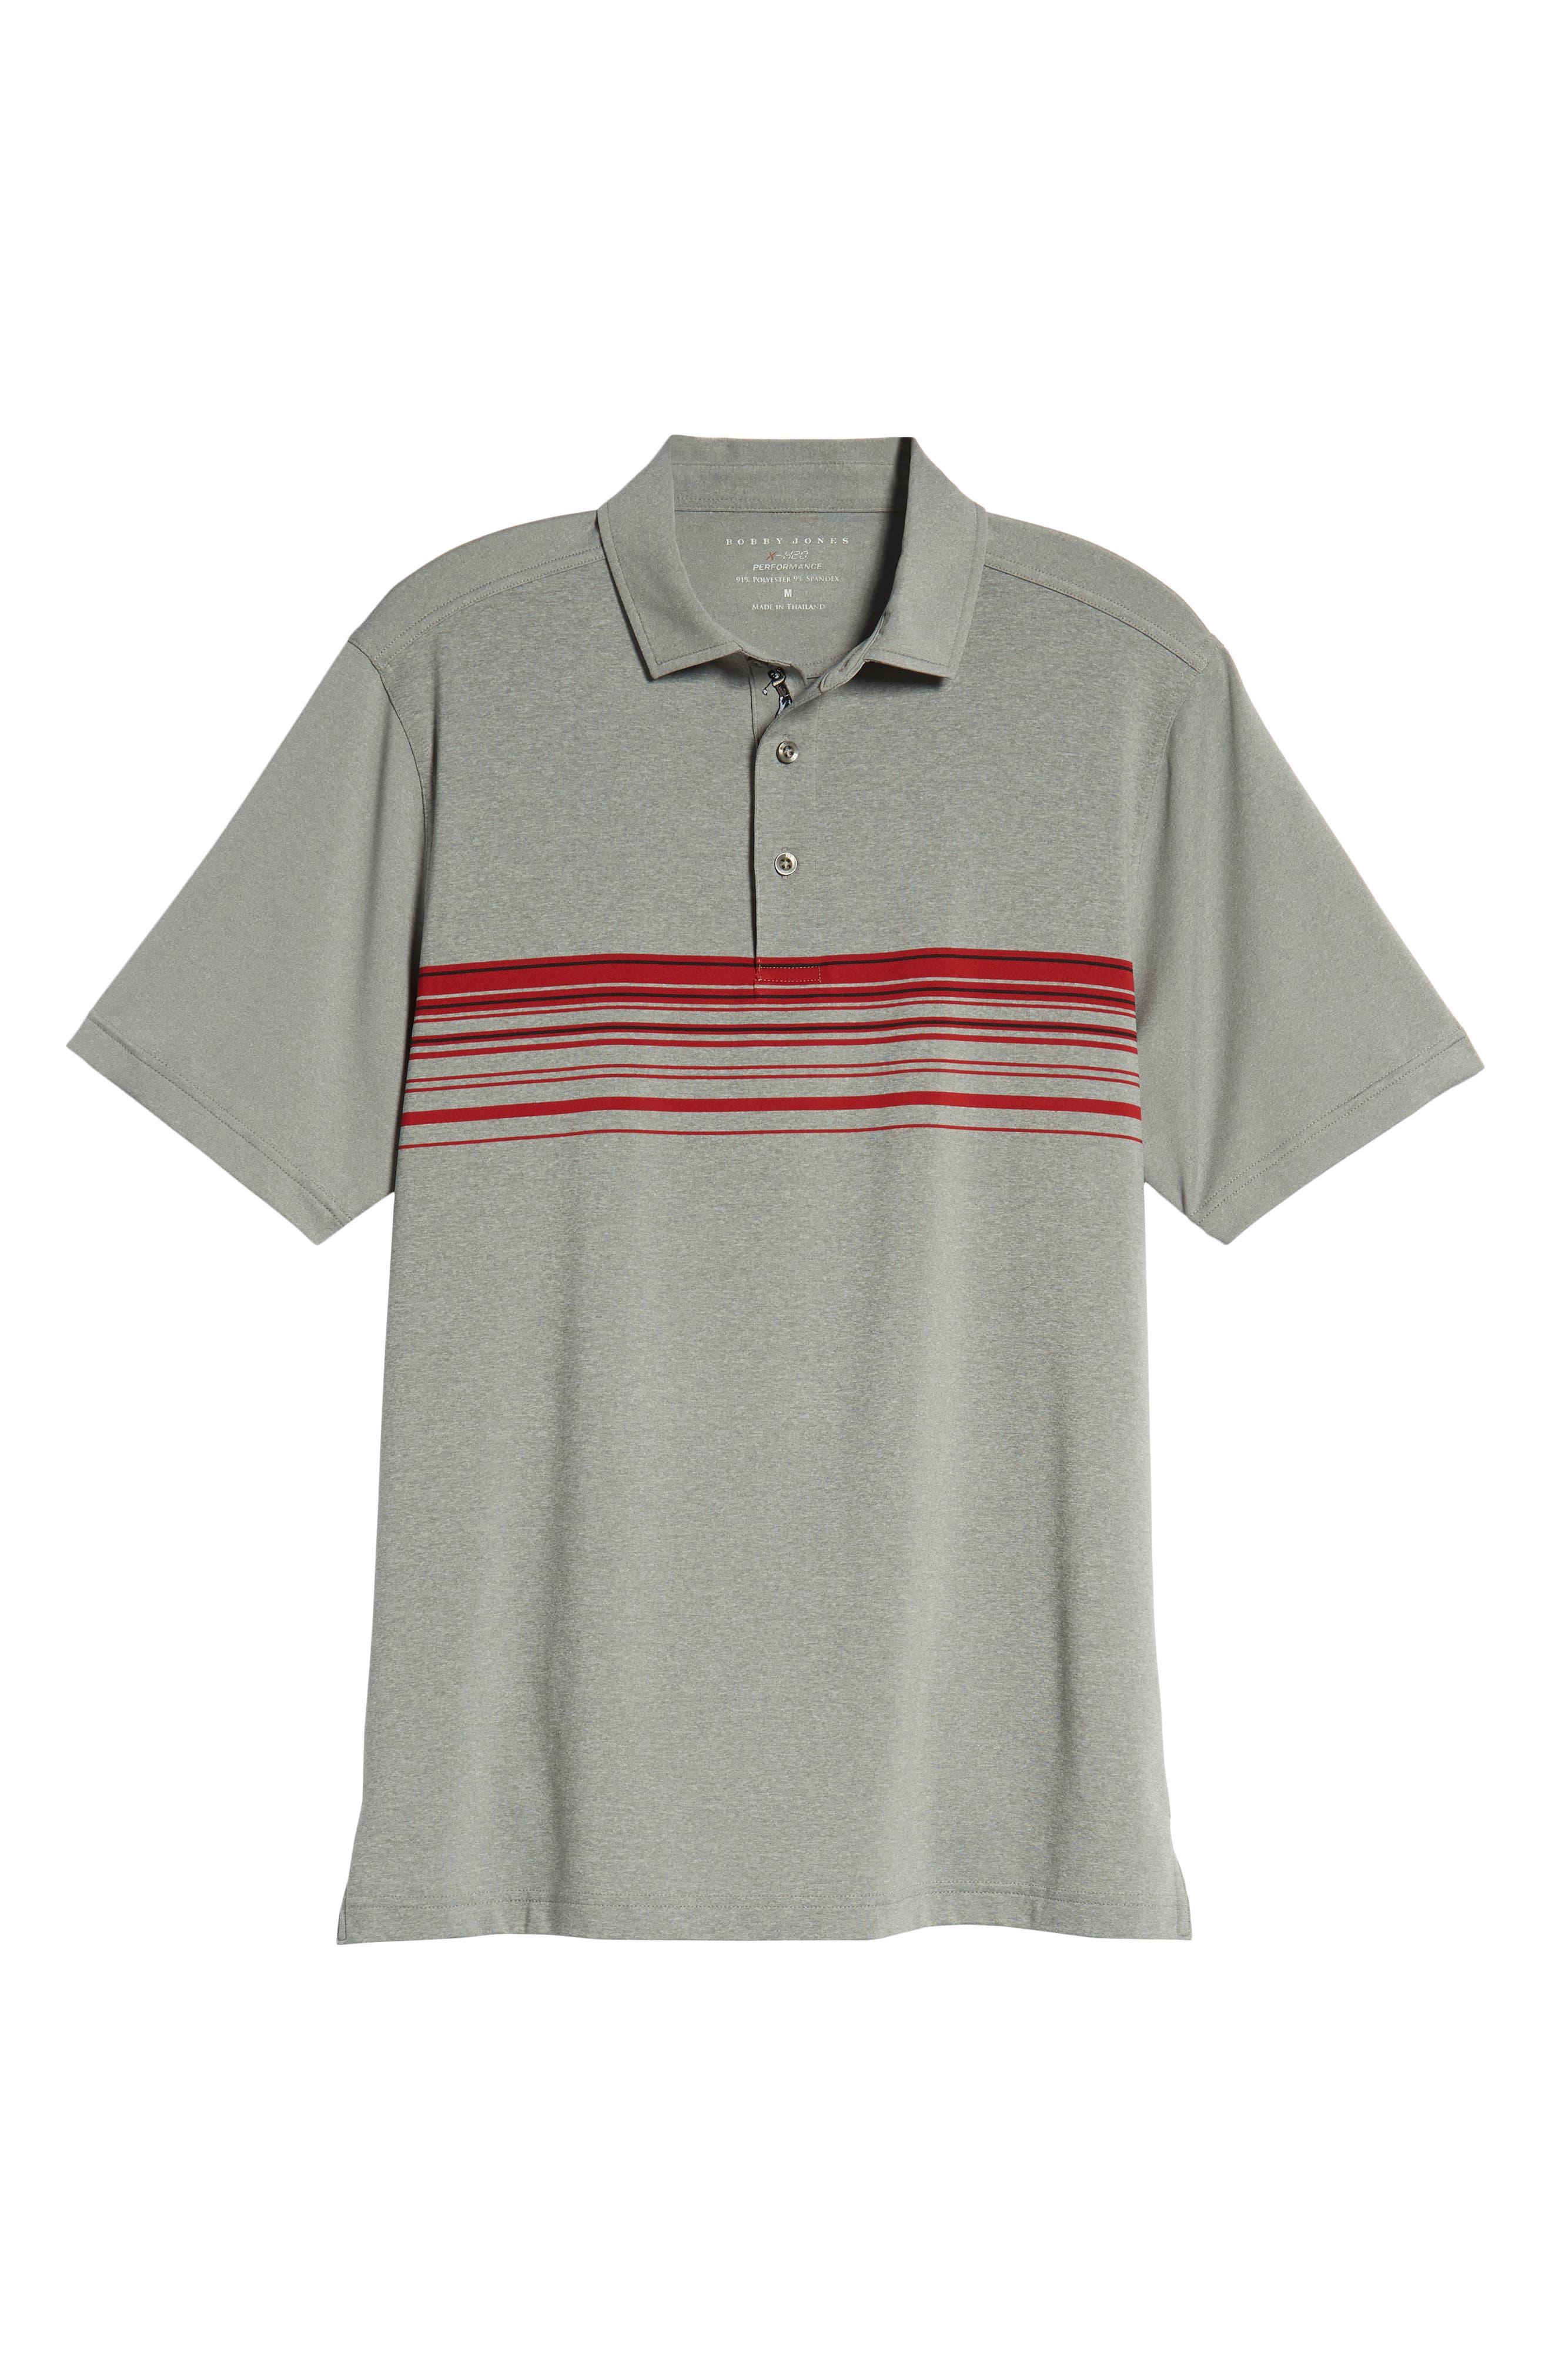 XH20 Gable Stripe Jersey Polo,                             Alternate thumbnail 6, color,                             GRAPHITE